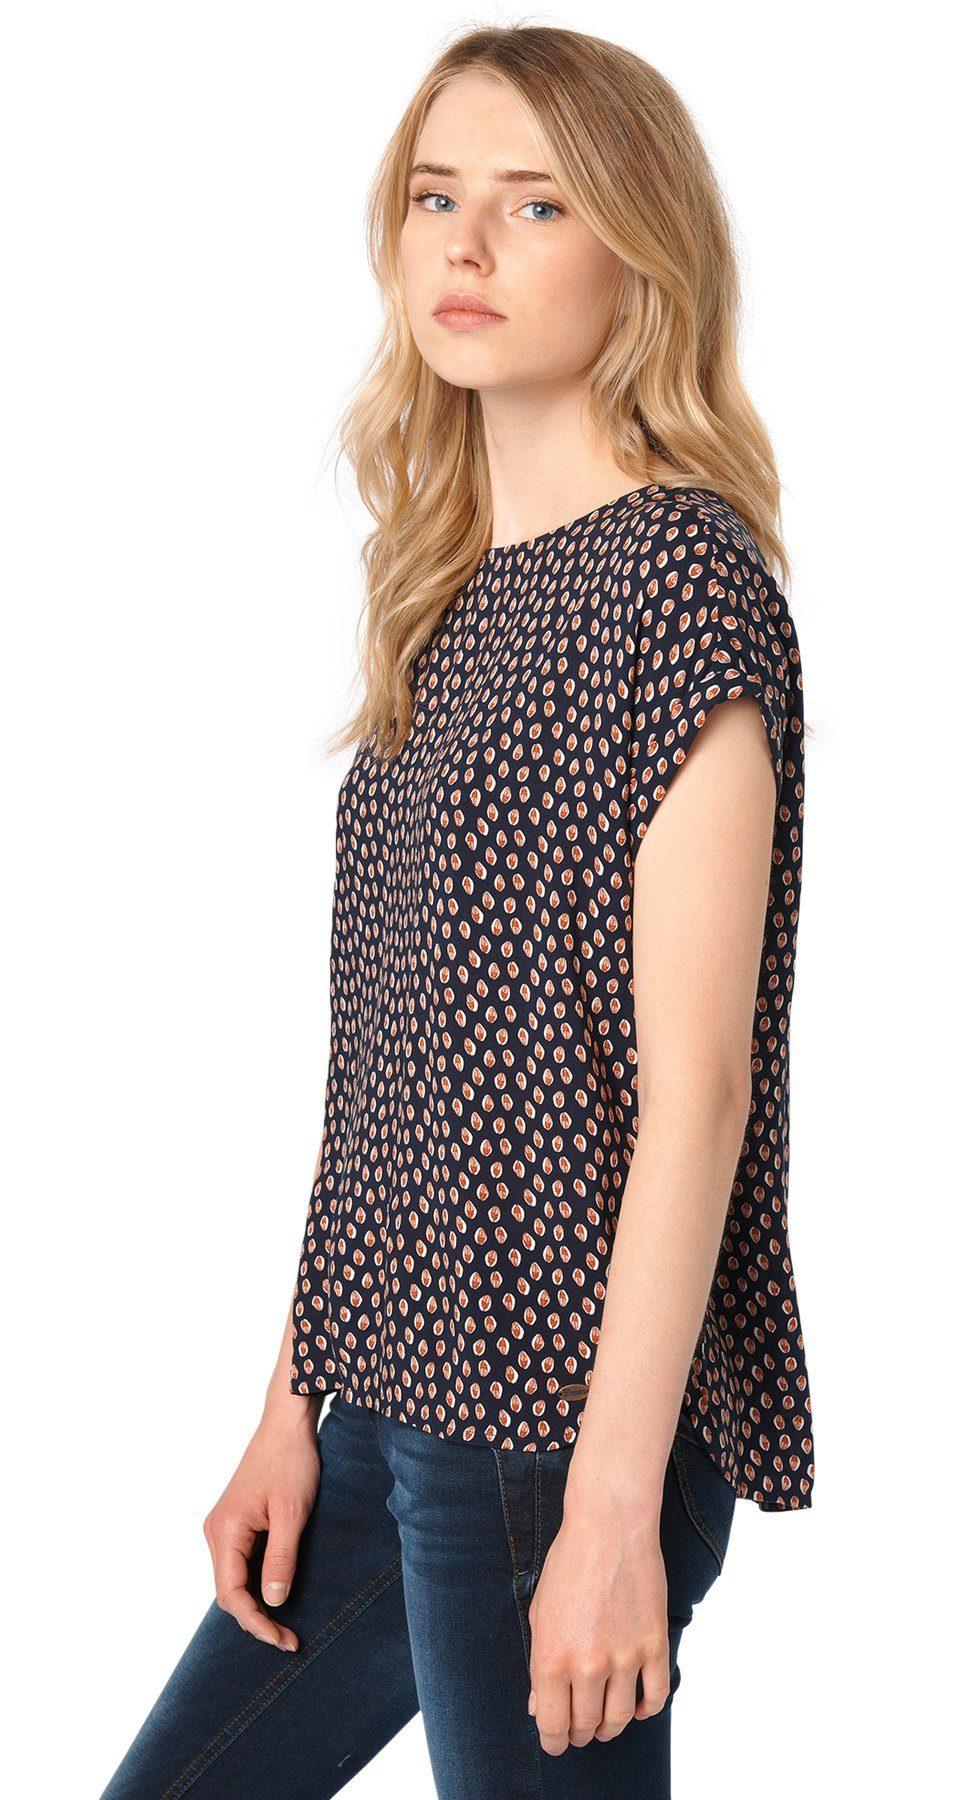 TOM TAILOR DENIM Bluse »Allover-Print Shirt mit Zipper«